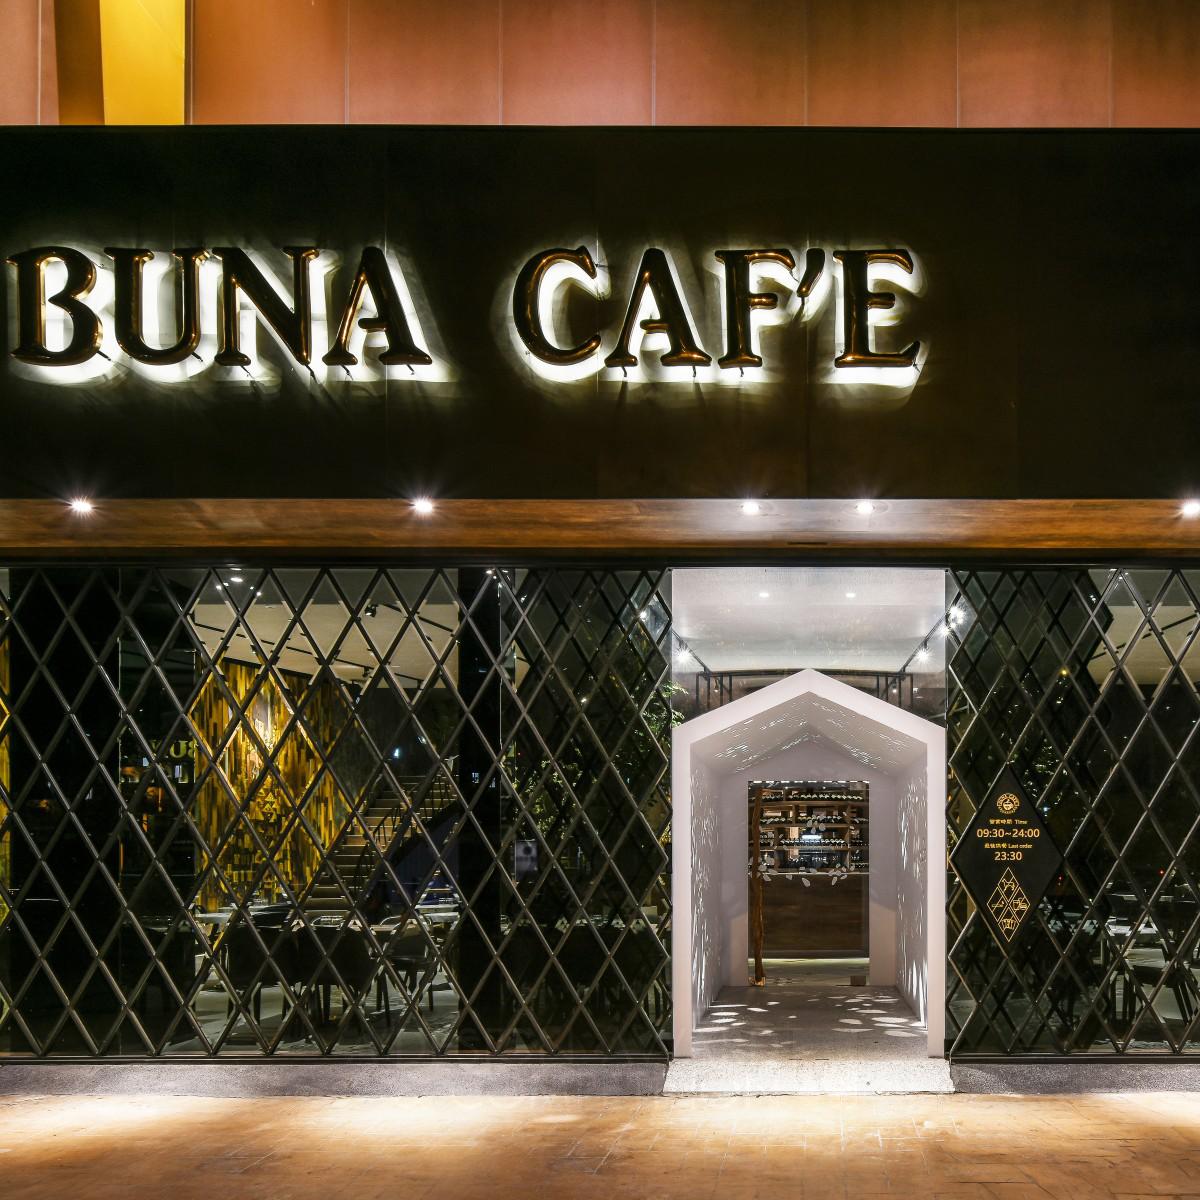 Buna Cafe Coffee restaurant